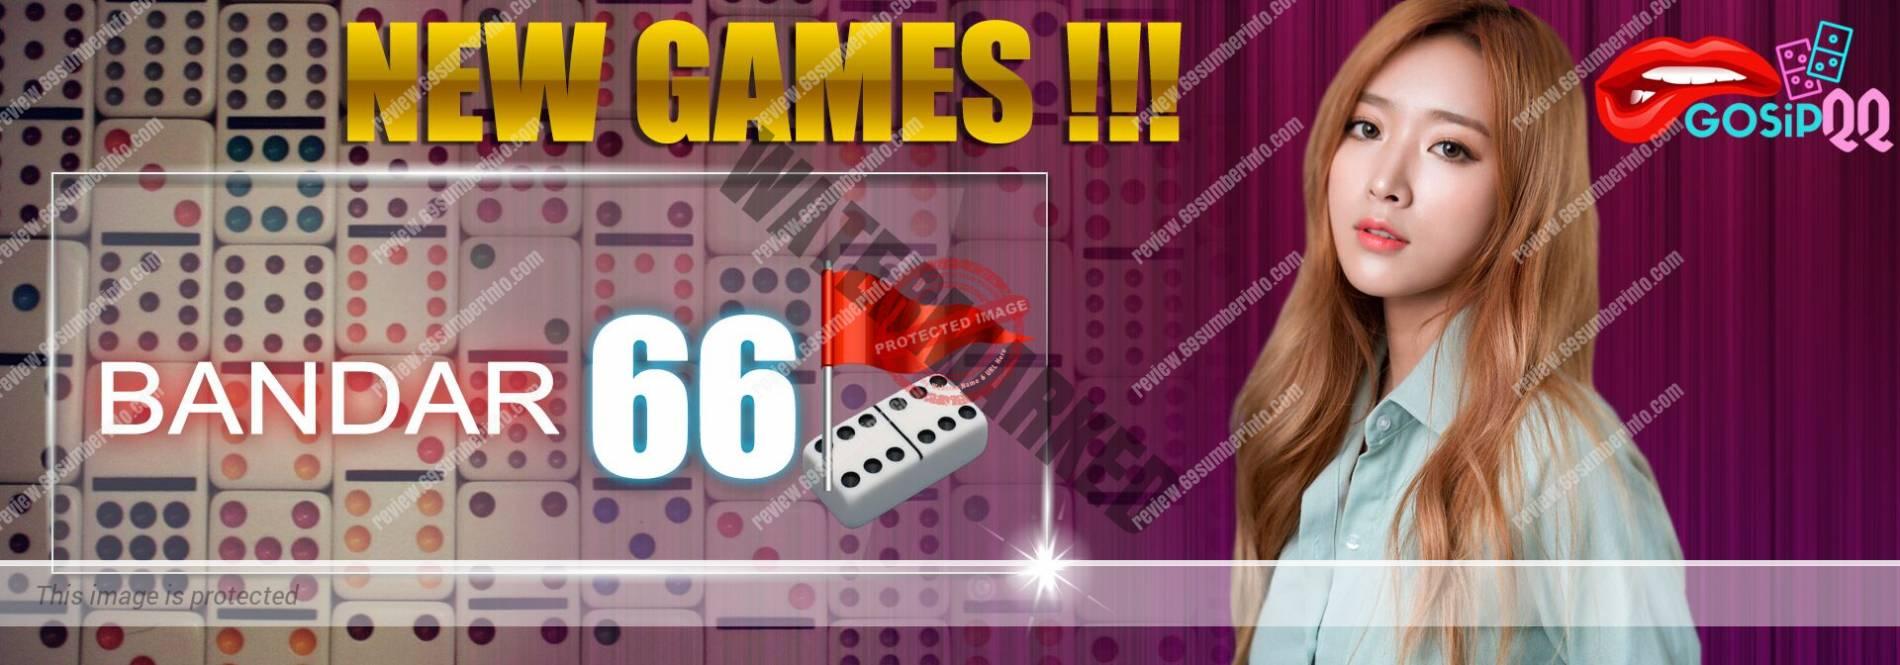 news games bandar 66